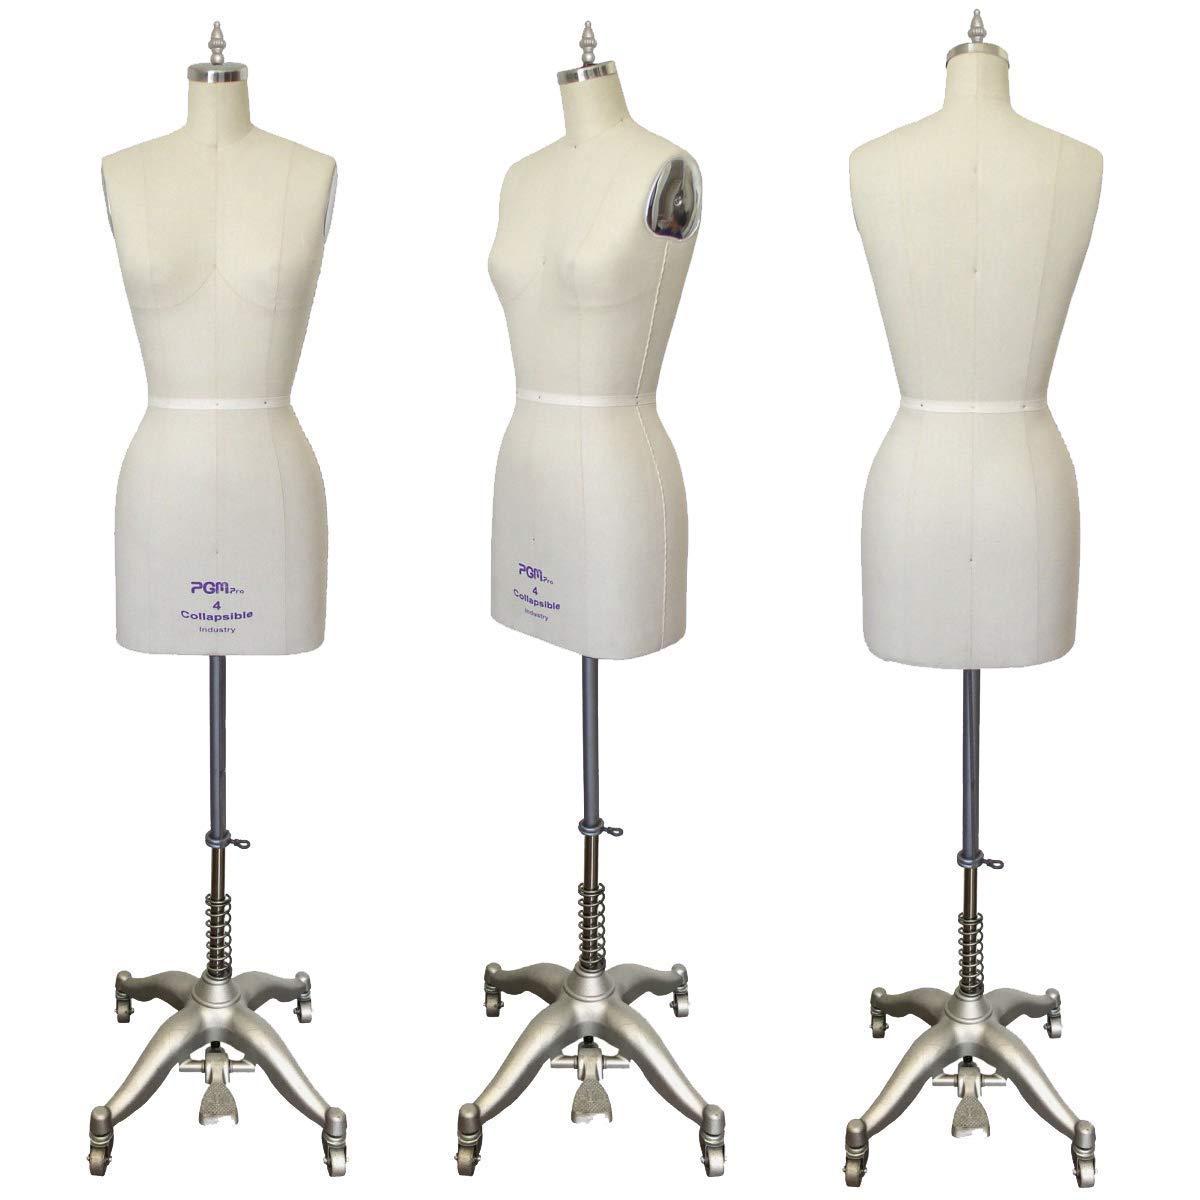 PGM Dress Form Size 4 w Collapsible Shoulder, Flat Hip Professional Female Dress Form. 3 Year Manufacturer Warranty! Inc. 602-04